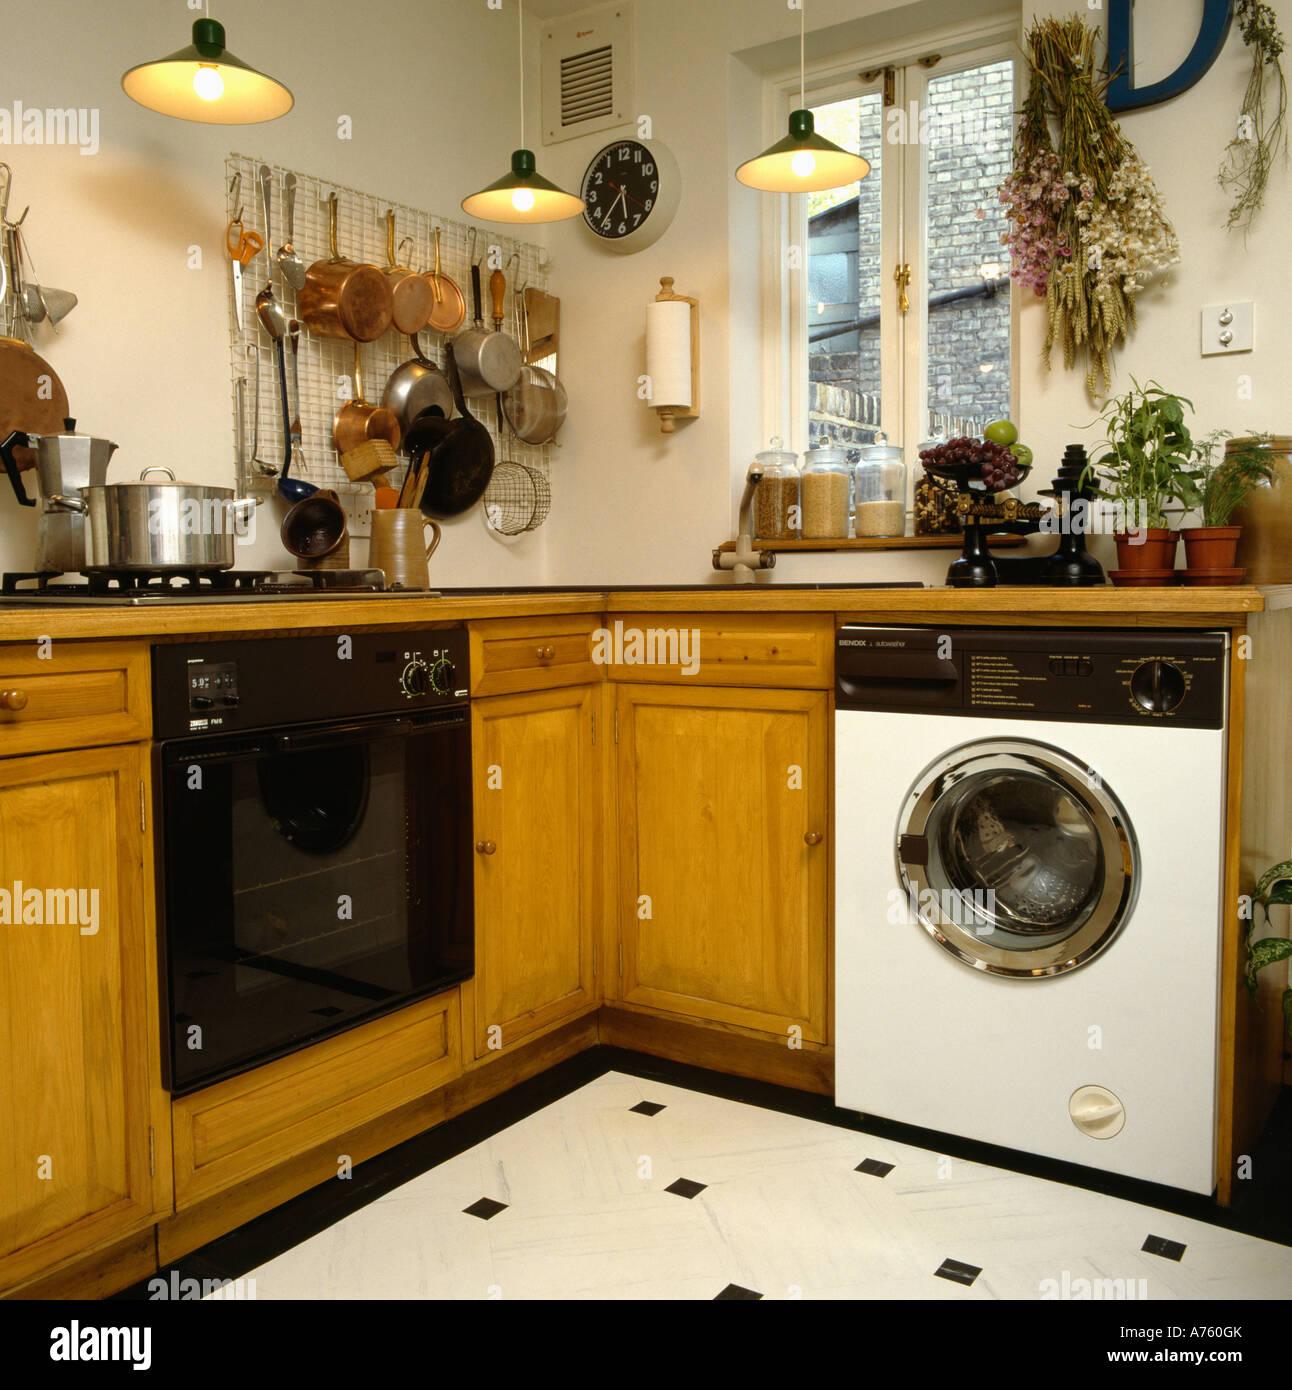 ... Washing Machine In Kitchen Design Washingmachine Stock Photos U0026  Washingmachine Stock Images Alamy ...